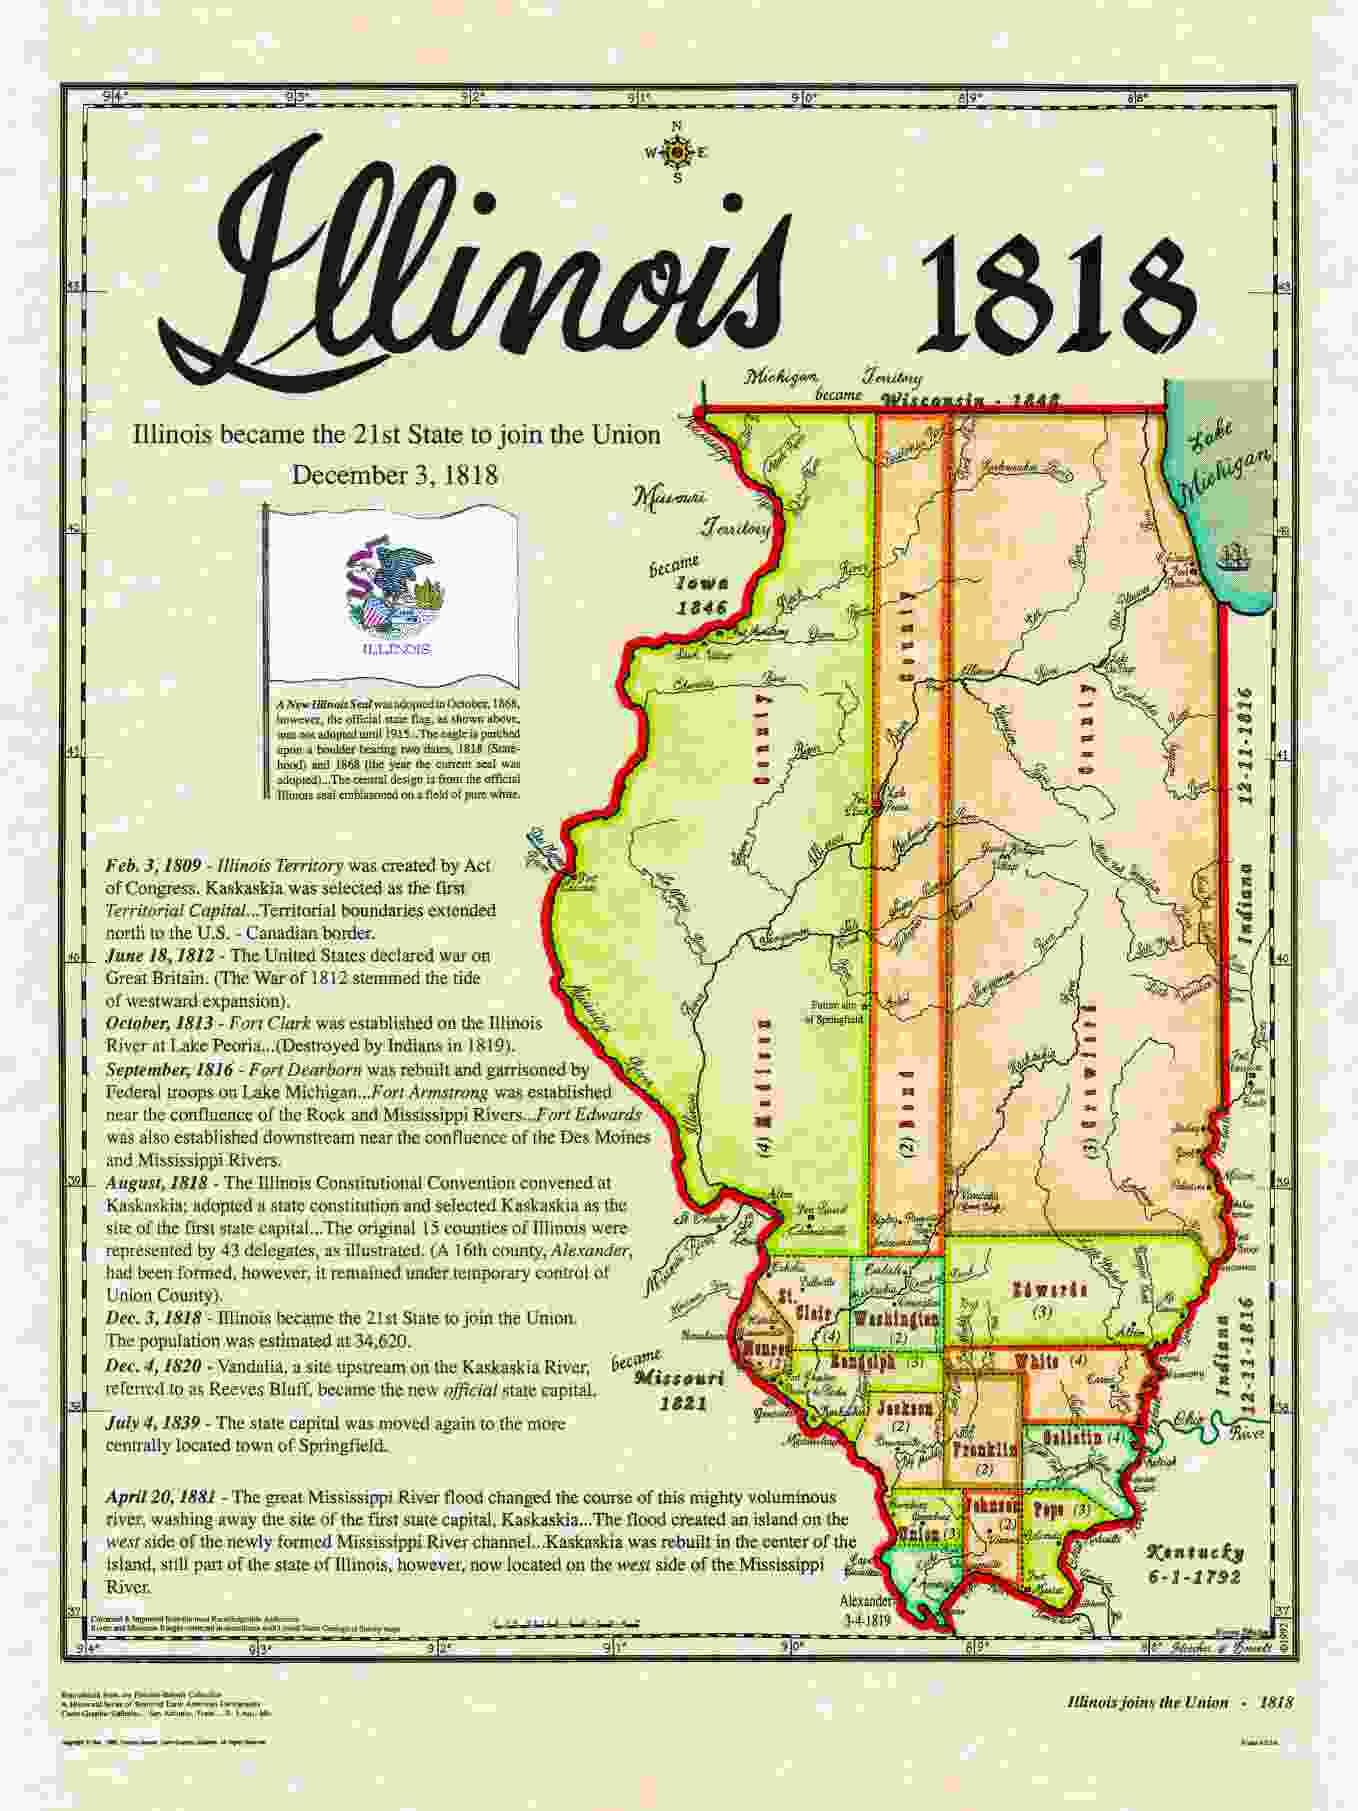 Statehood Maps on illinois state flag, illinois union map, illinois state city map, north dakota capital map, illinois state highway map, illinois state land map, illinois state motto, illinois largest cities map, illinois state map online, illinois state bird, illinois state capitol, georgetown capital map, illinois state project, illinois forest map, illinois deer map, illinois state fairgrounds map, illinois state flower, illinois springfield map, illinois state us map, u.s. capitol complex map,